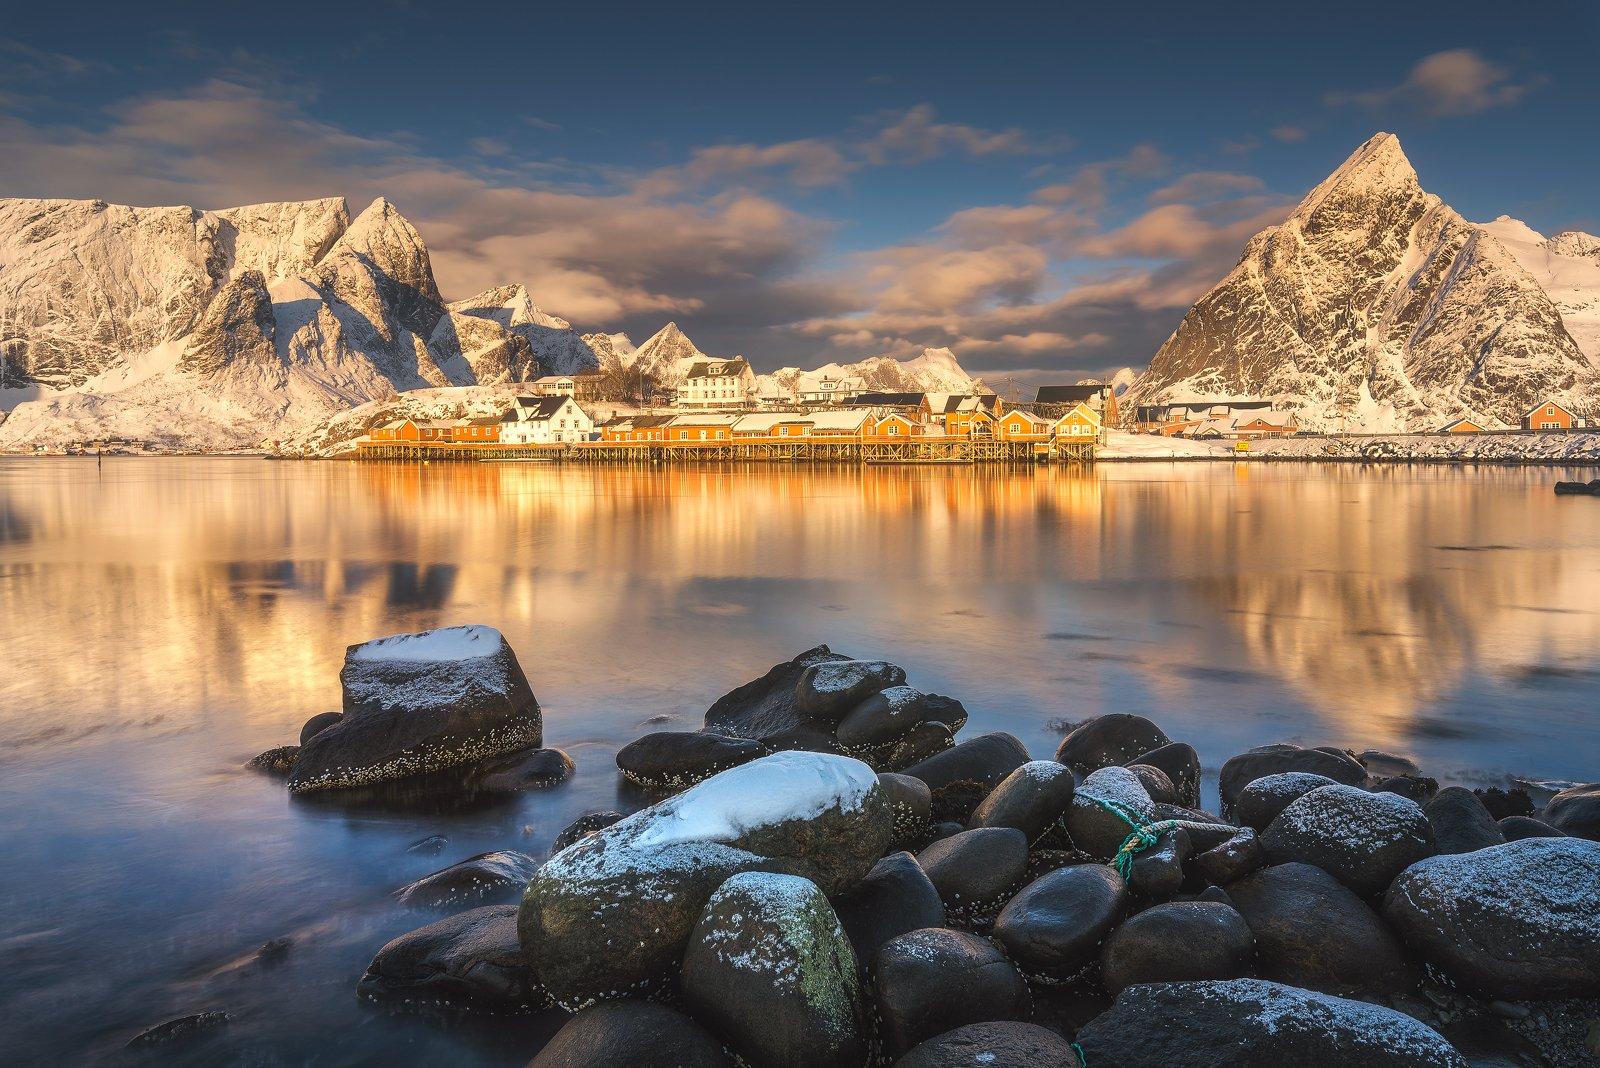 lofoten, sakrisoy, reflections, morning, mountains, seascape, landscape, water, light, Bartłomiej Kończak